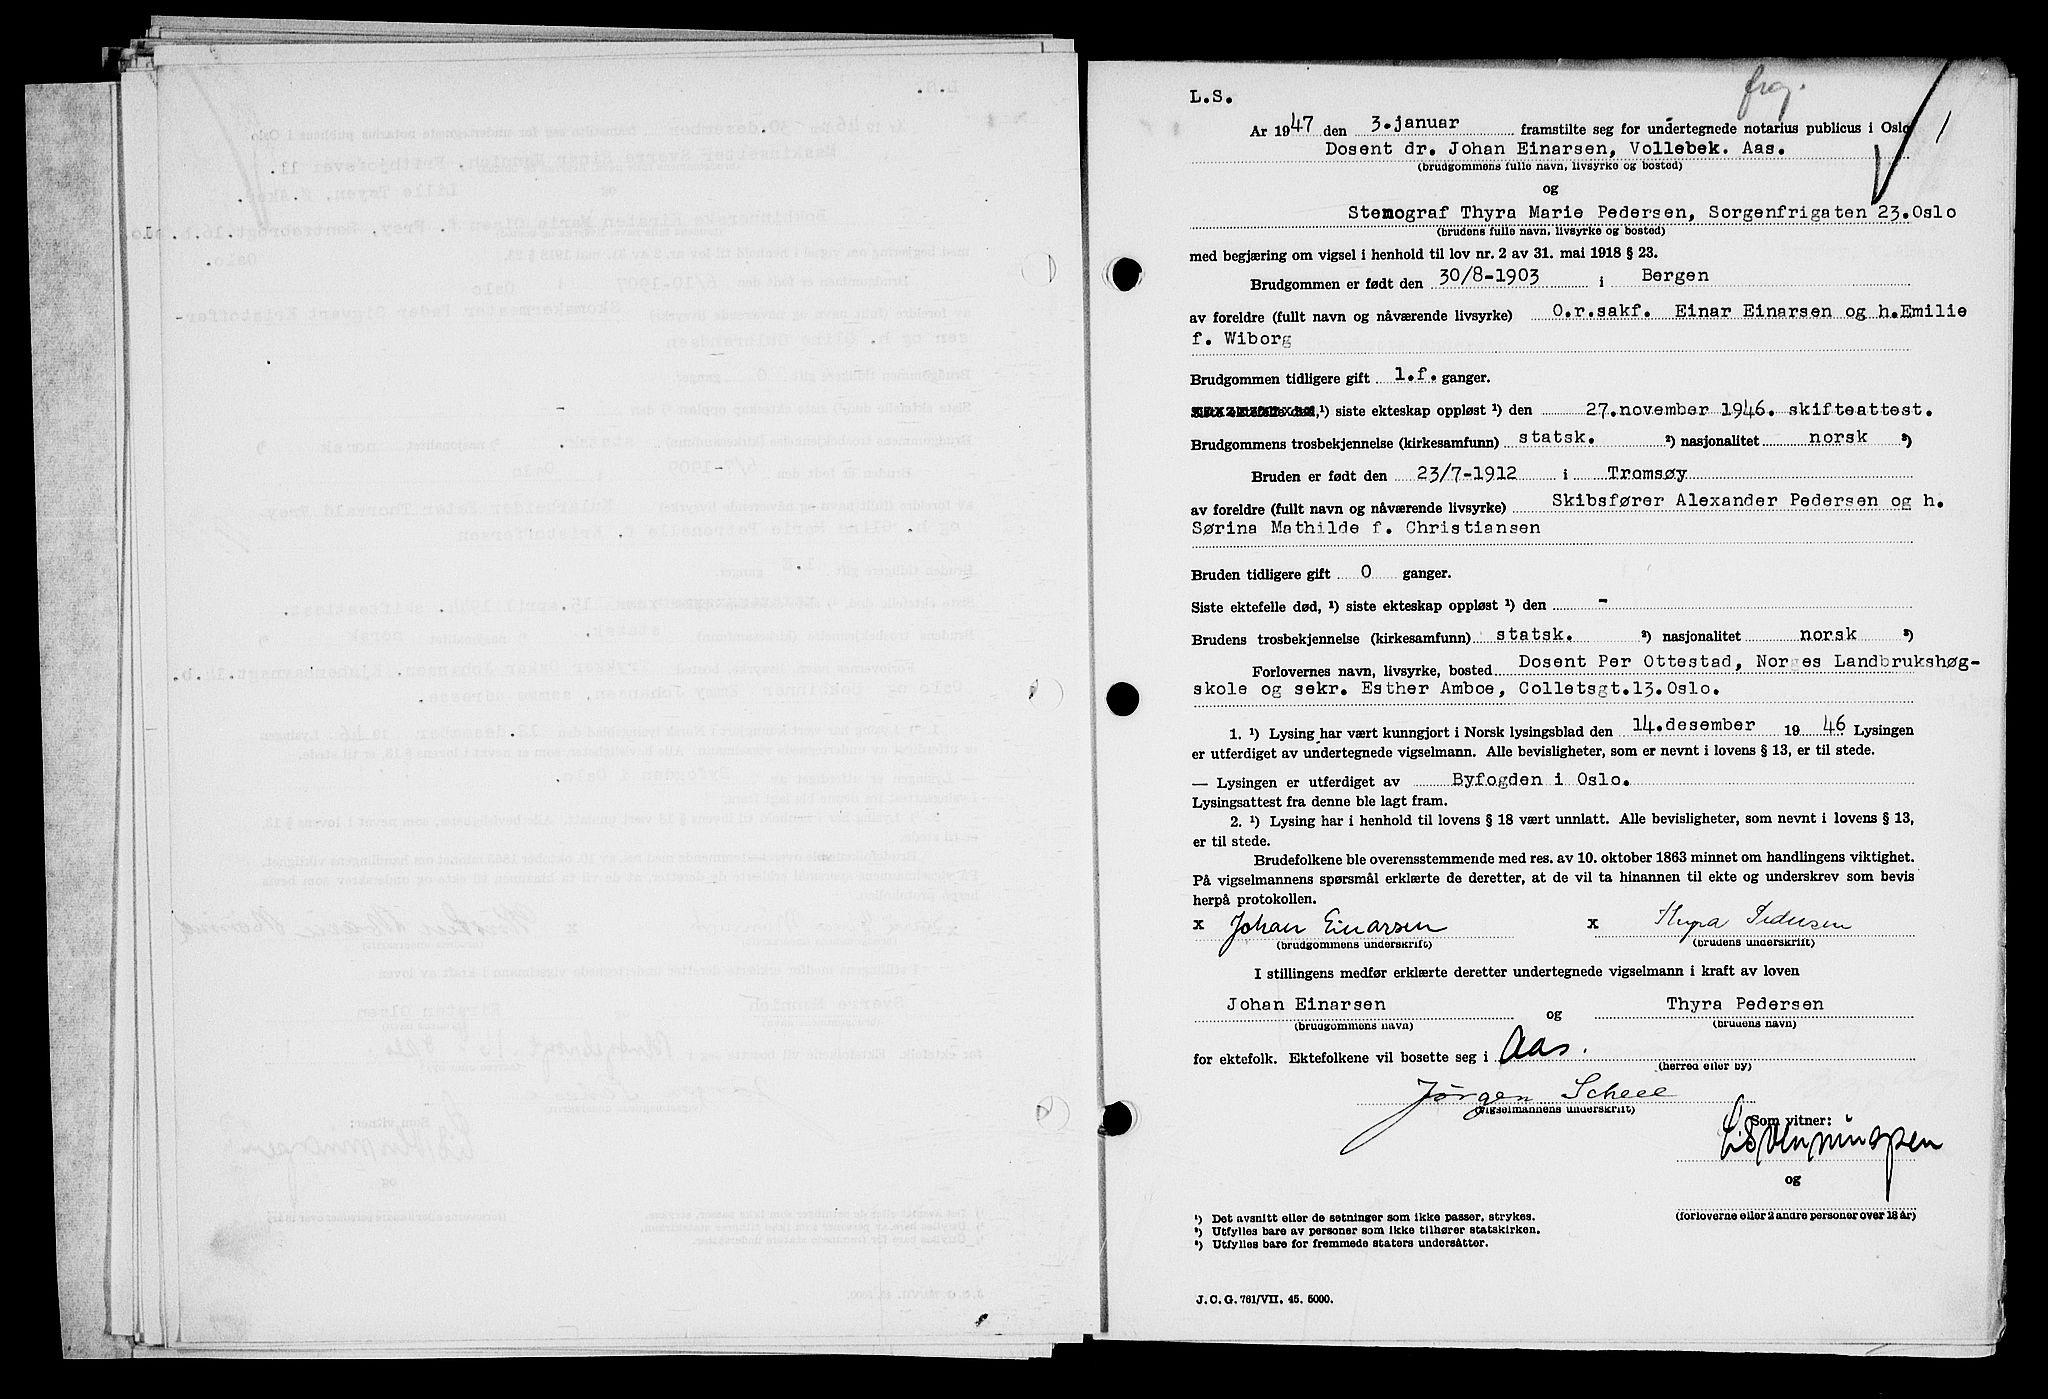 SAO, Oslo byfogd avd. I, L/Lb/Lbb/L0058: Notarialprotokoll, rekke II: Vigsler, 1946-1947, s. upaginert